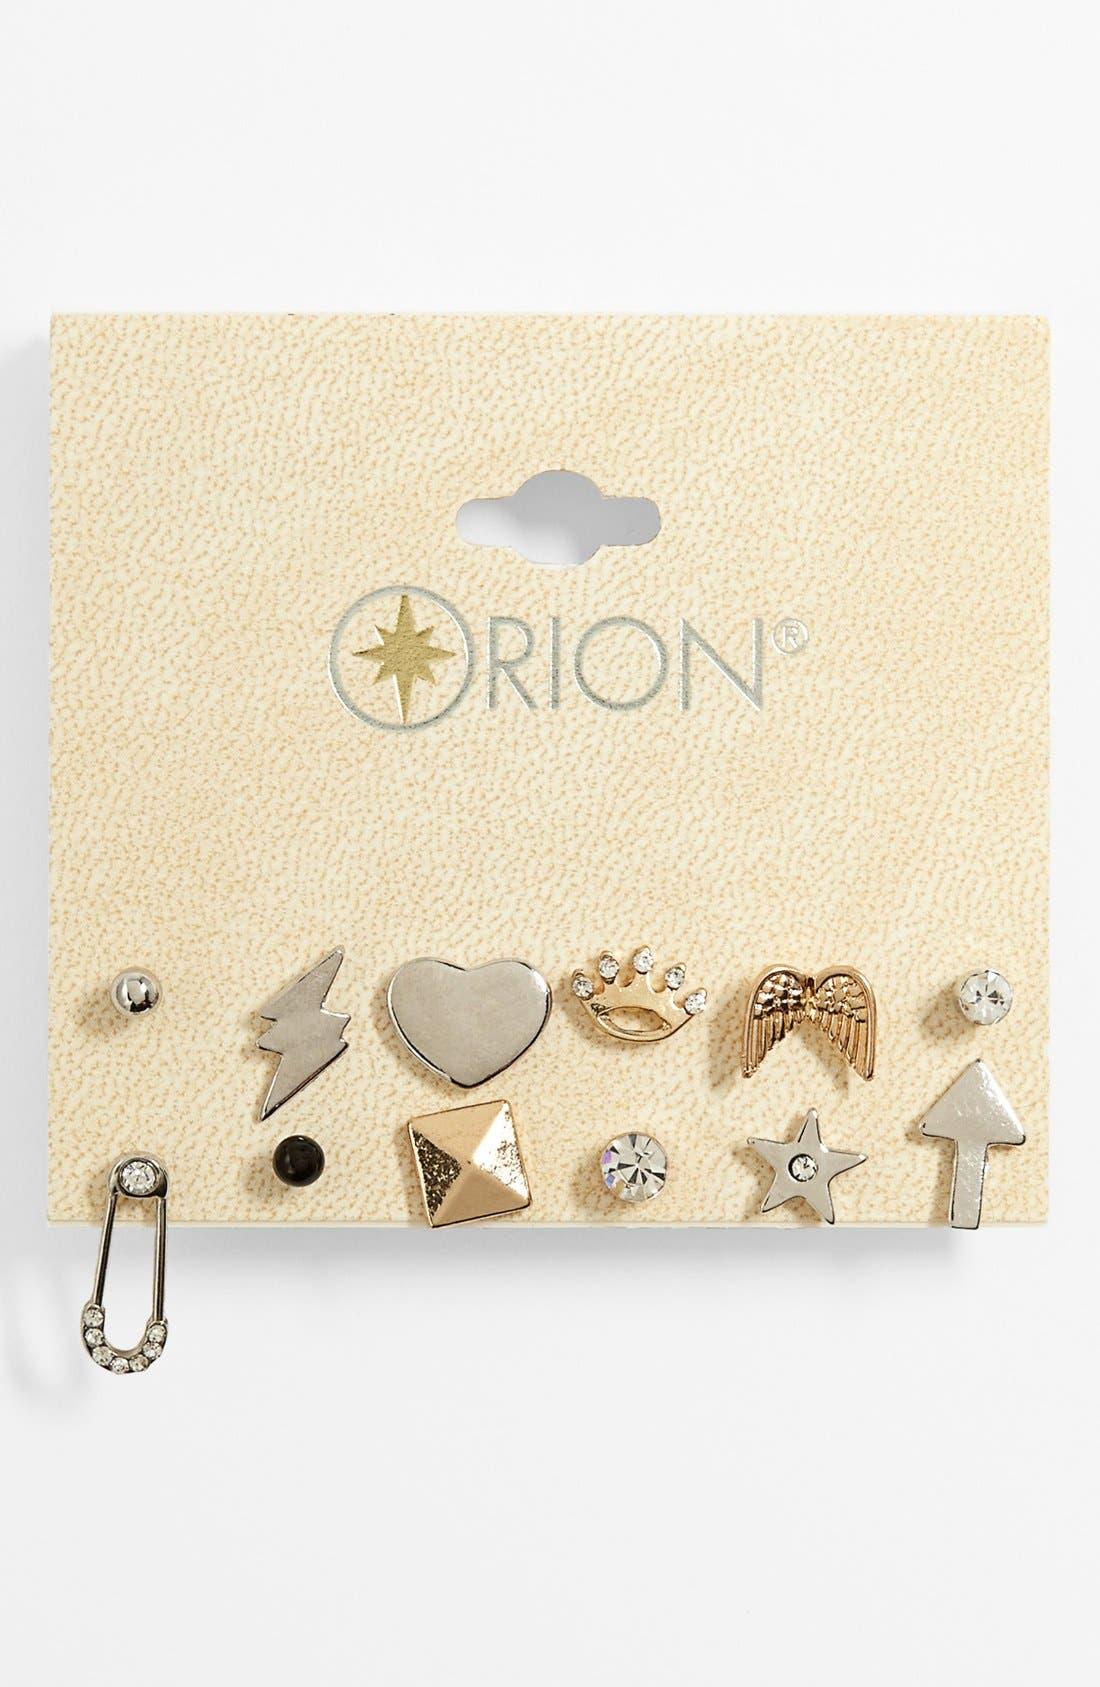 Alternate Image 1 Selected - Orion 'Princess' Stud Earrings (Set of 12)